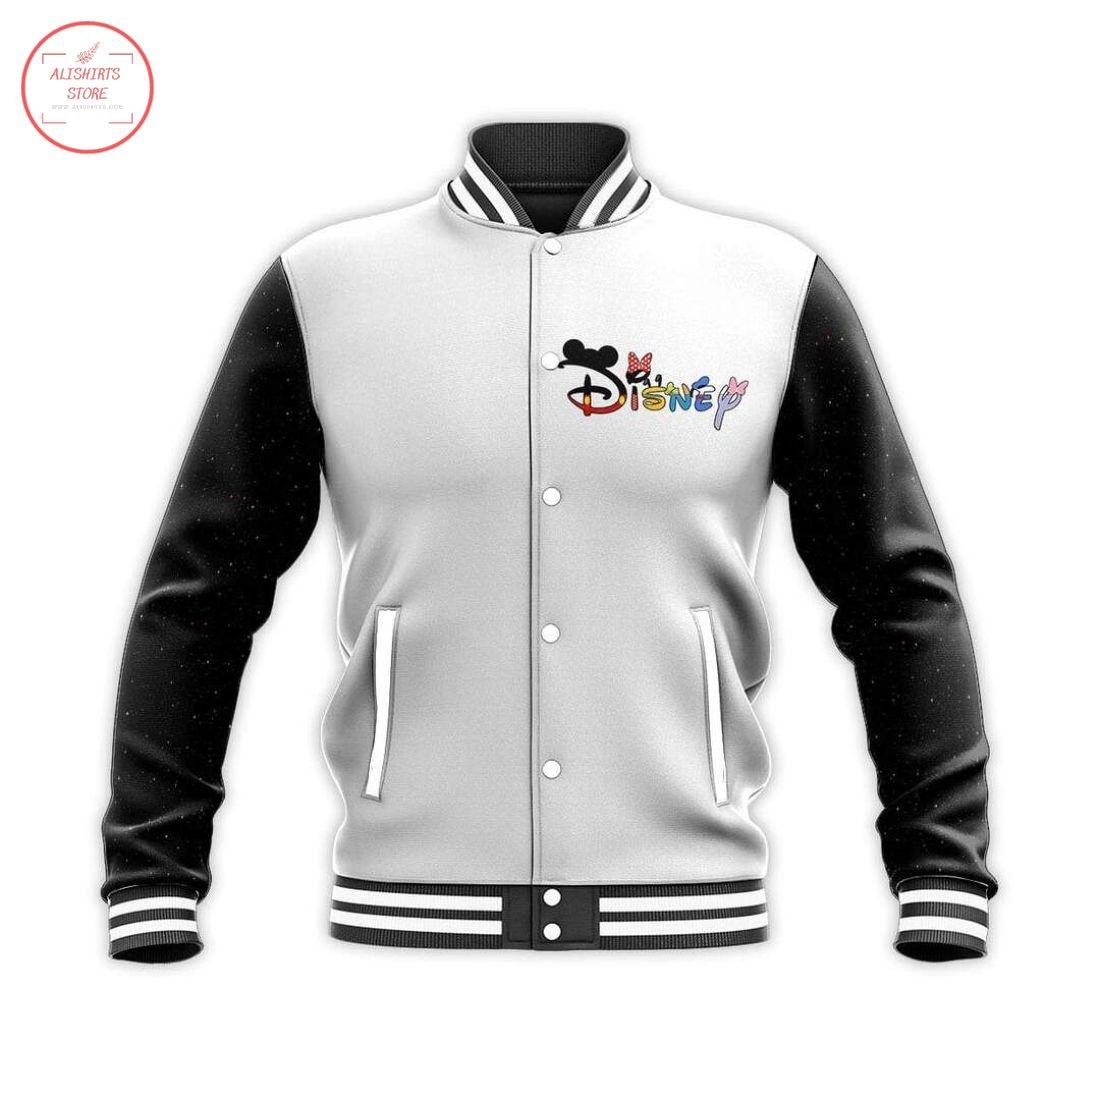 I Love Disney ClassicLetterman Jacket